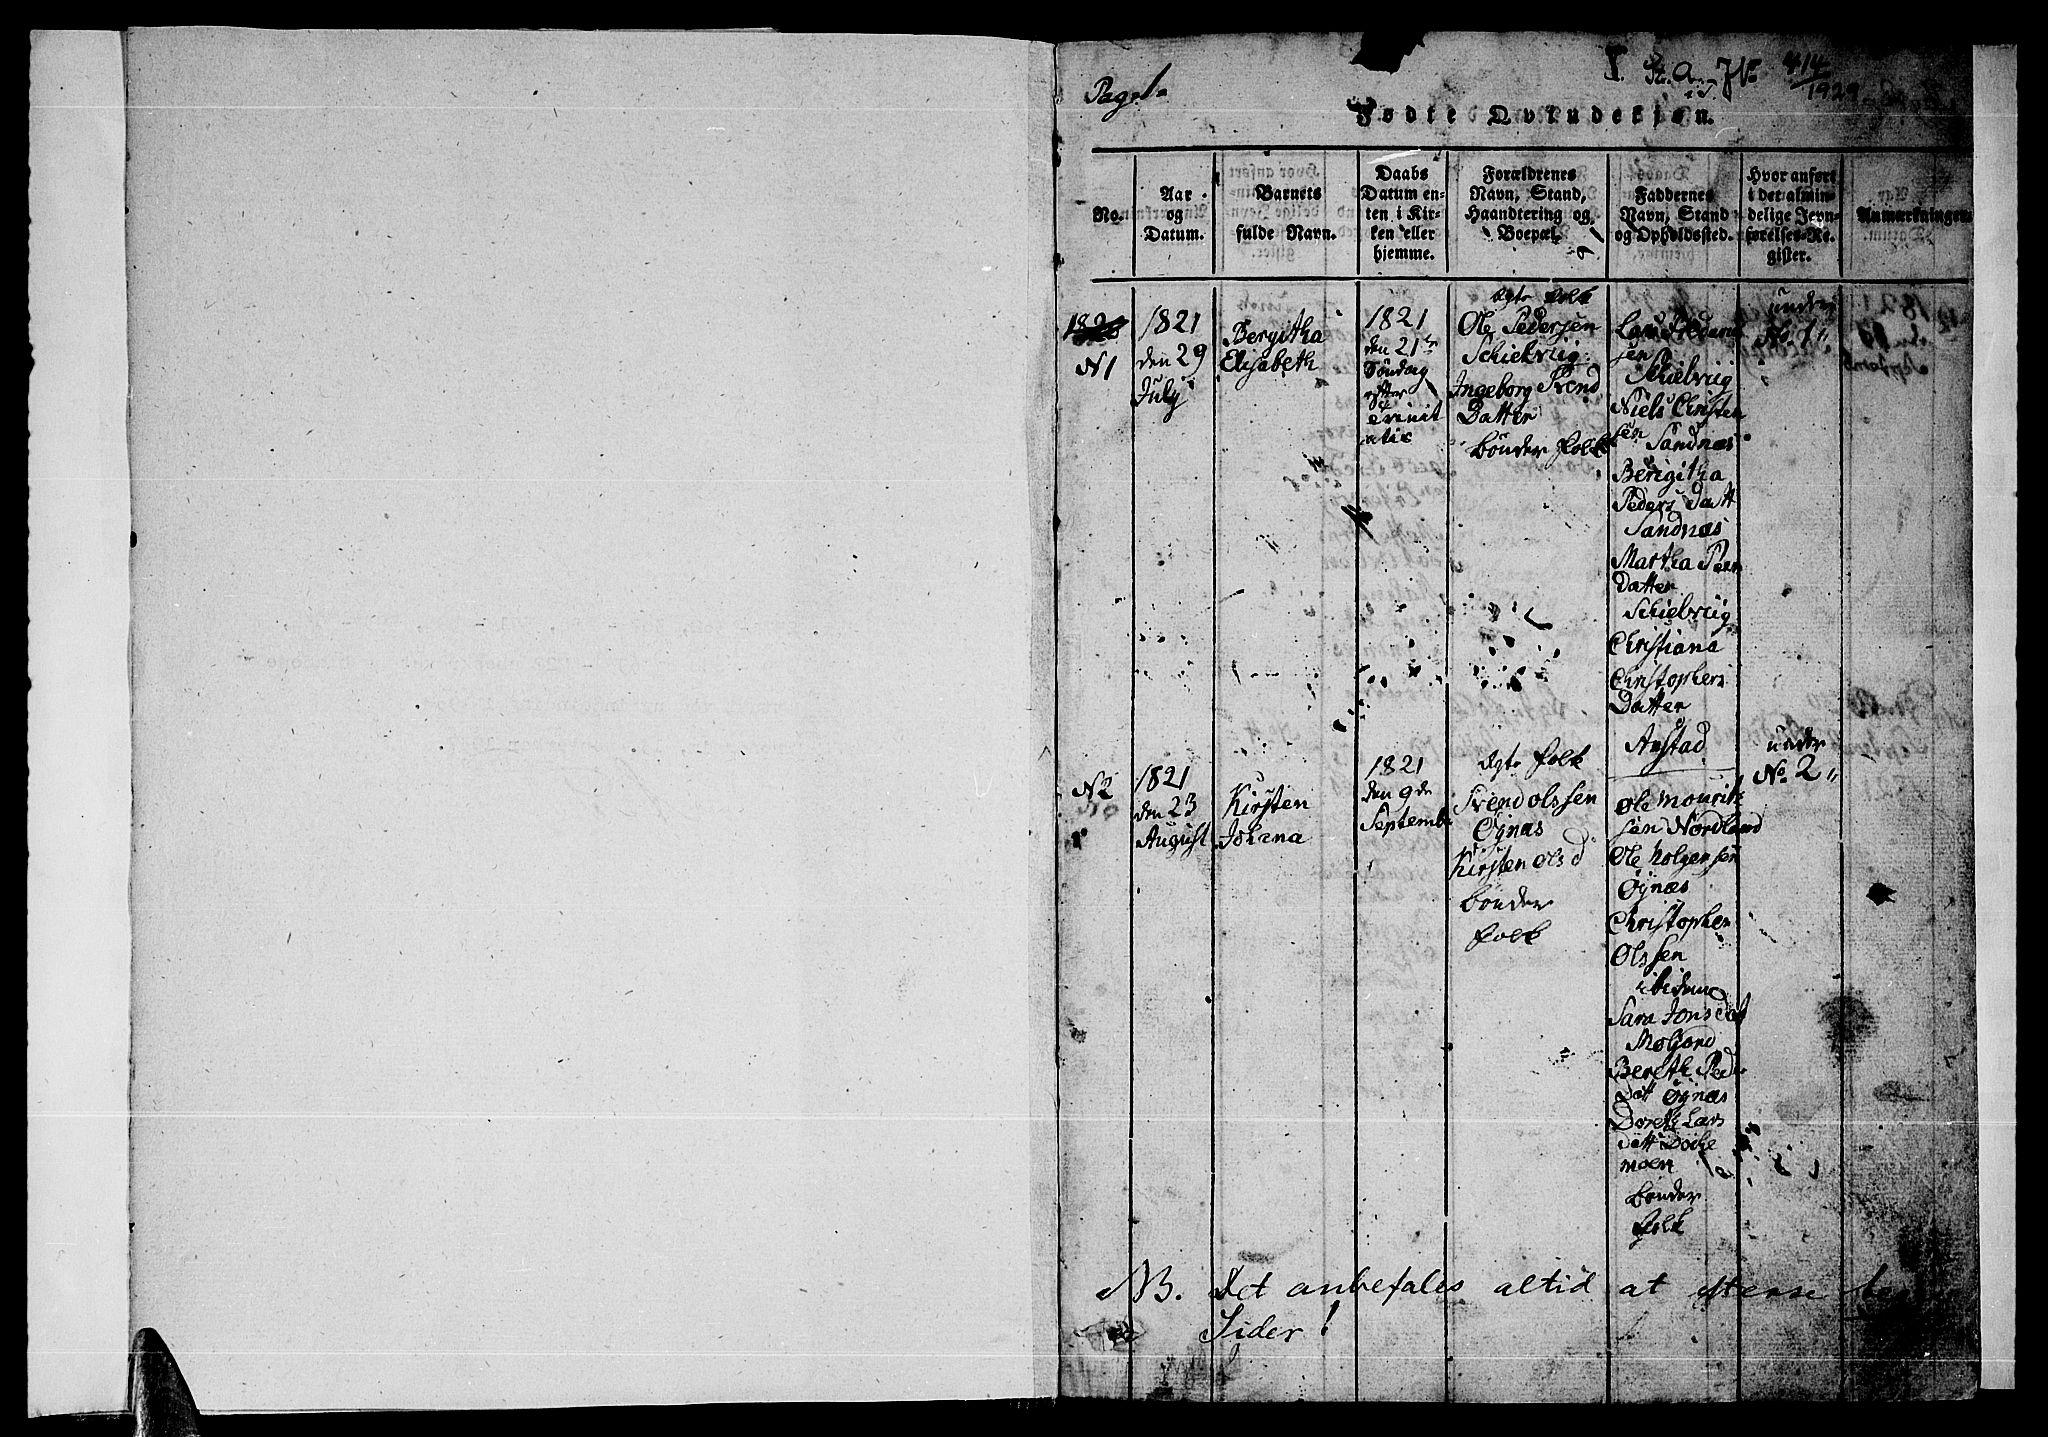 SAT, Ministerialprotokoller, klokkerbøker og fødselsregistre - Nordland, 846/L0651: Klokkerbok nr. 846C01, 1821-1841, s. 1